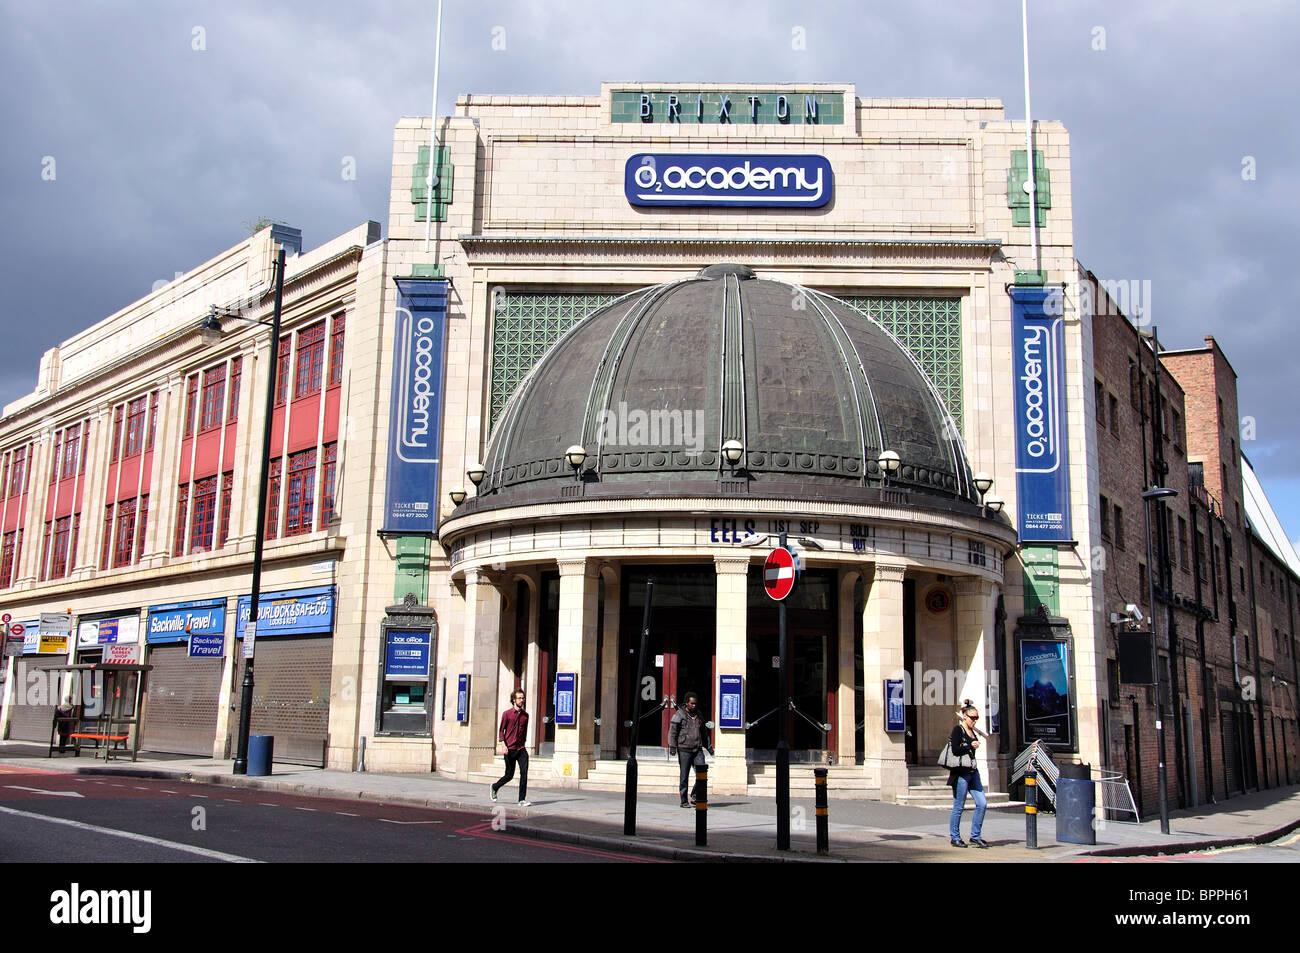 O2 Academy Brixton, Stockwell Road, Brixton, London Borough of Lambeth, Greater London, England, United Kingdom Stock Photo